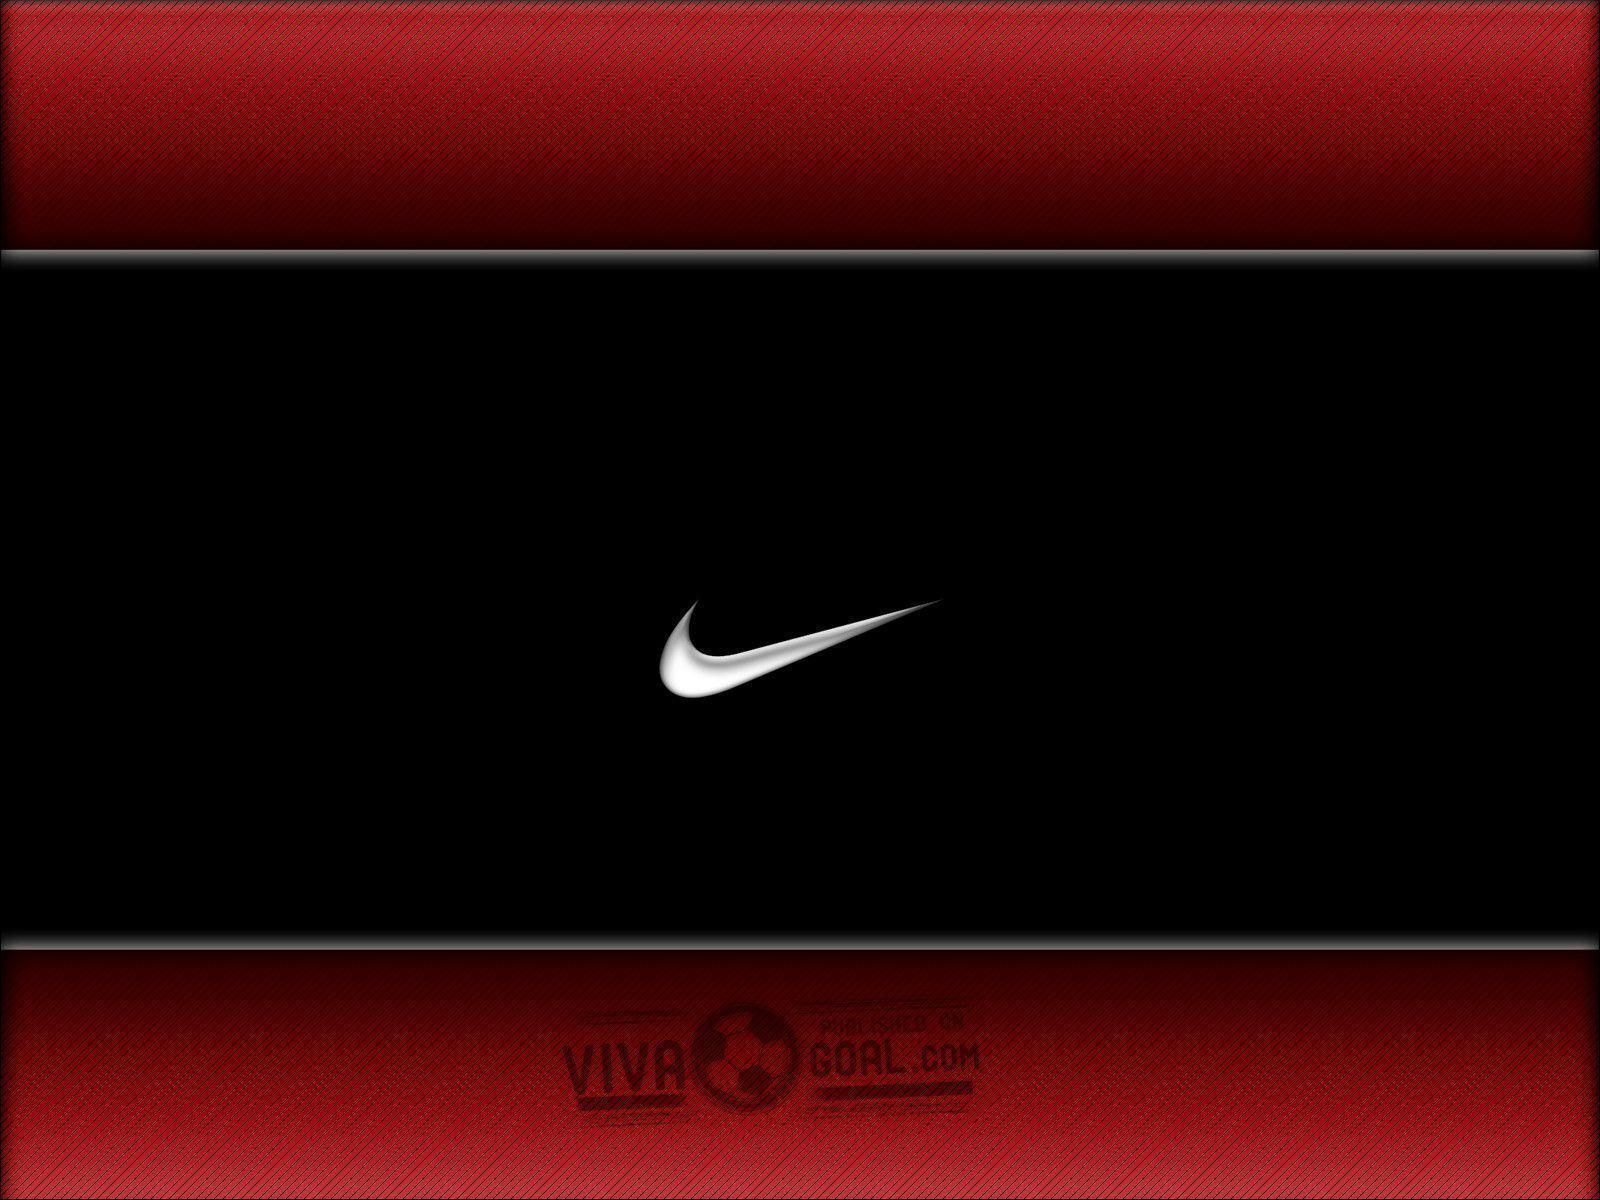 Sport Wallpaper Just Do It: Nike 3D Wallpapers